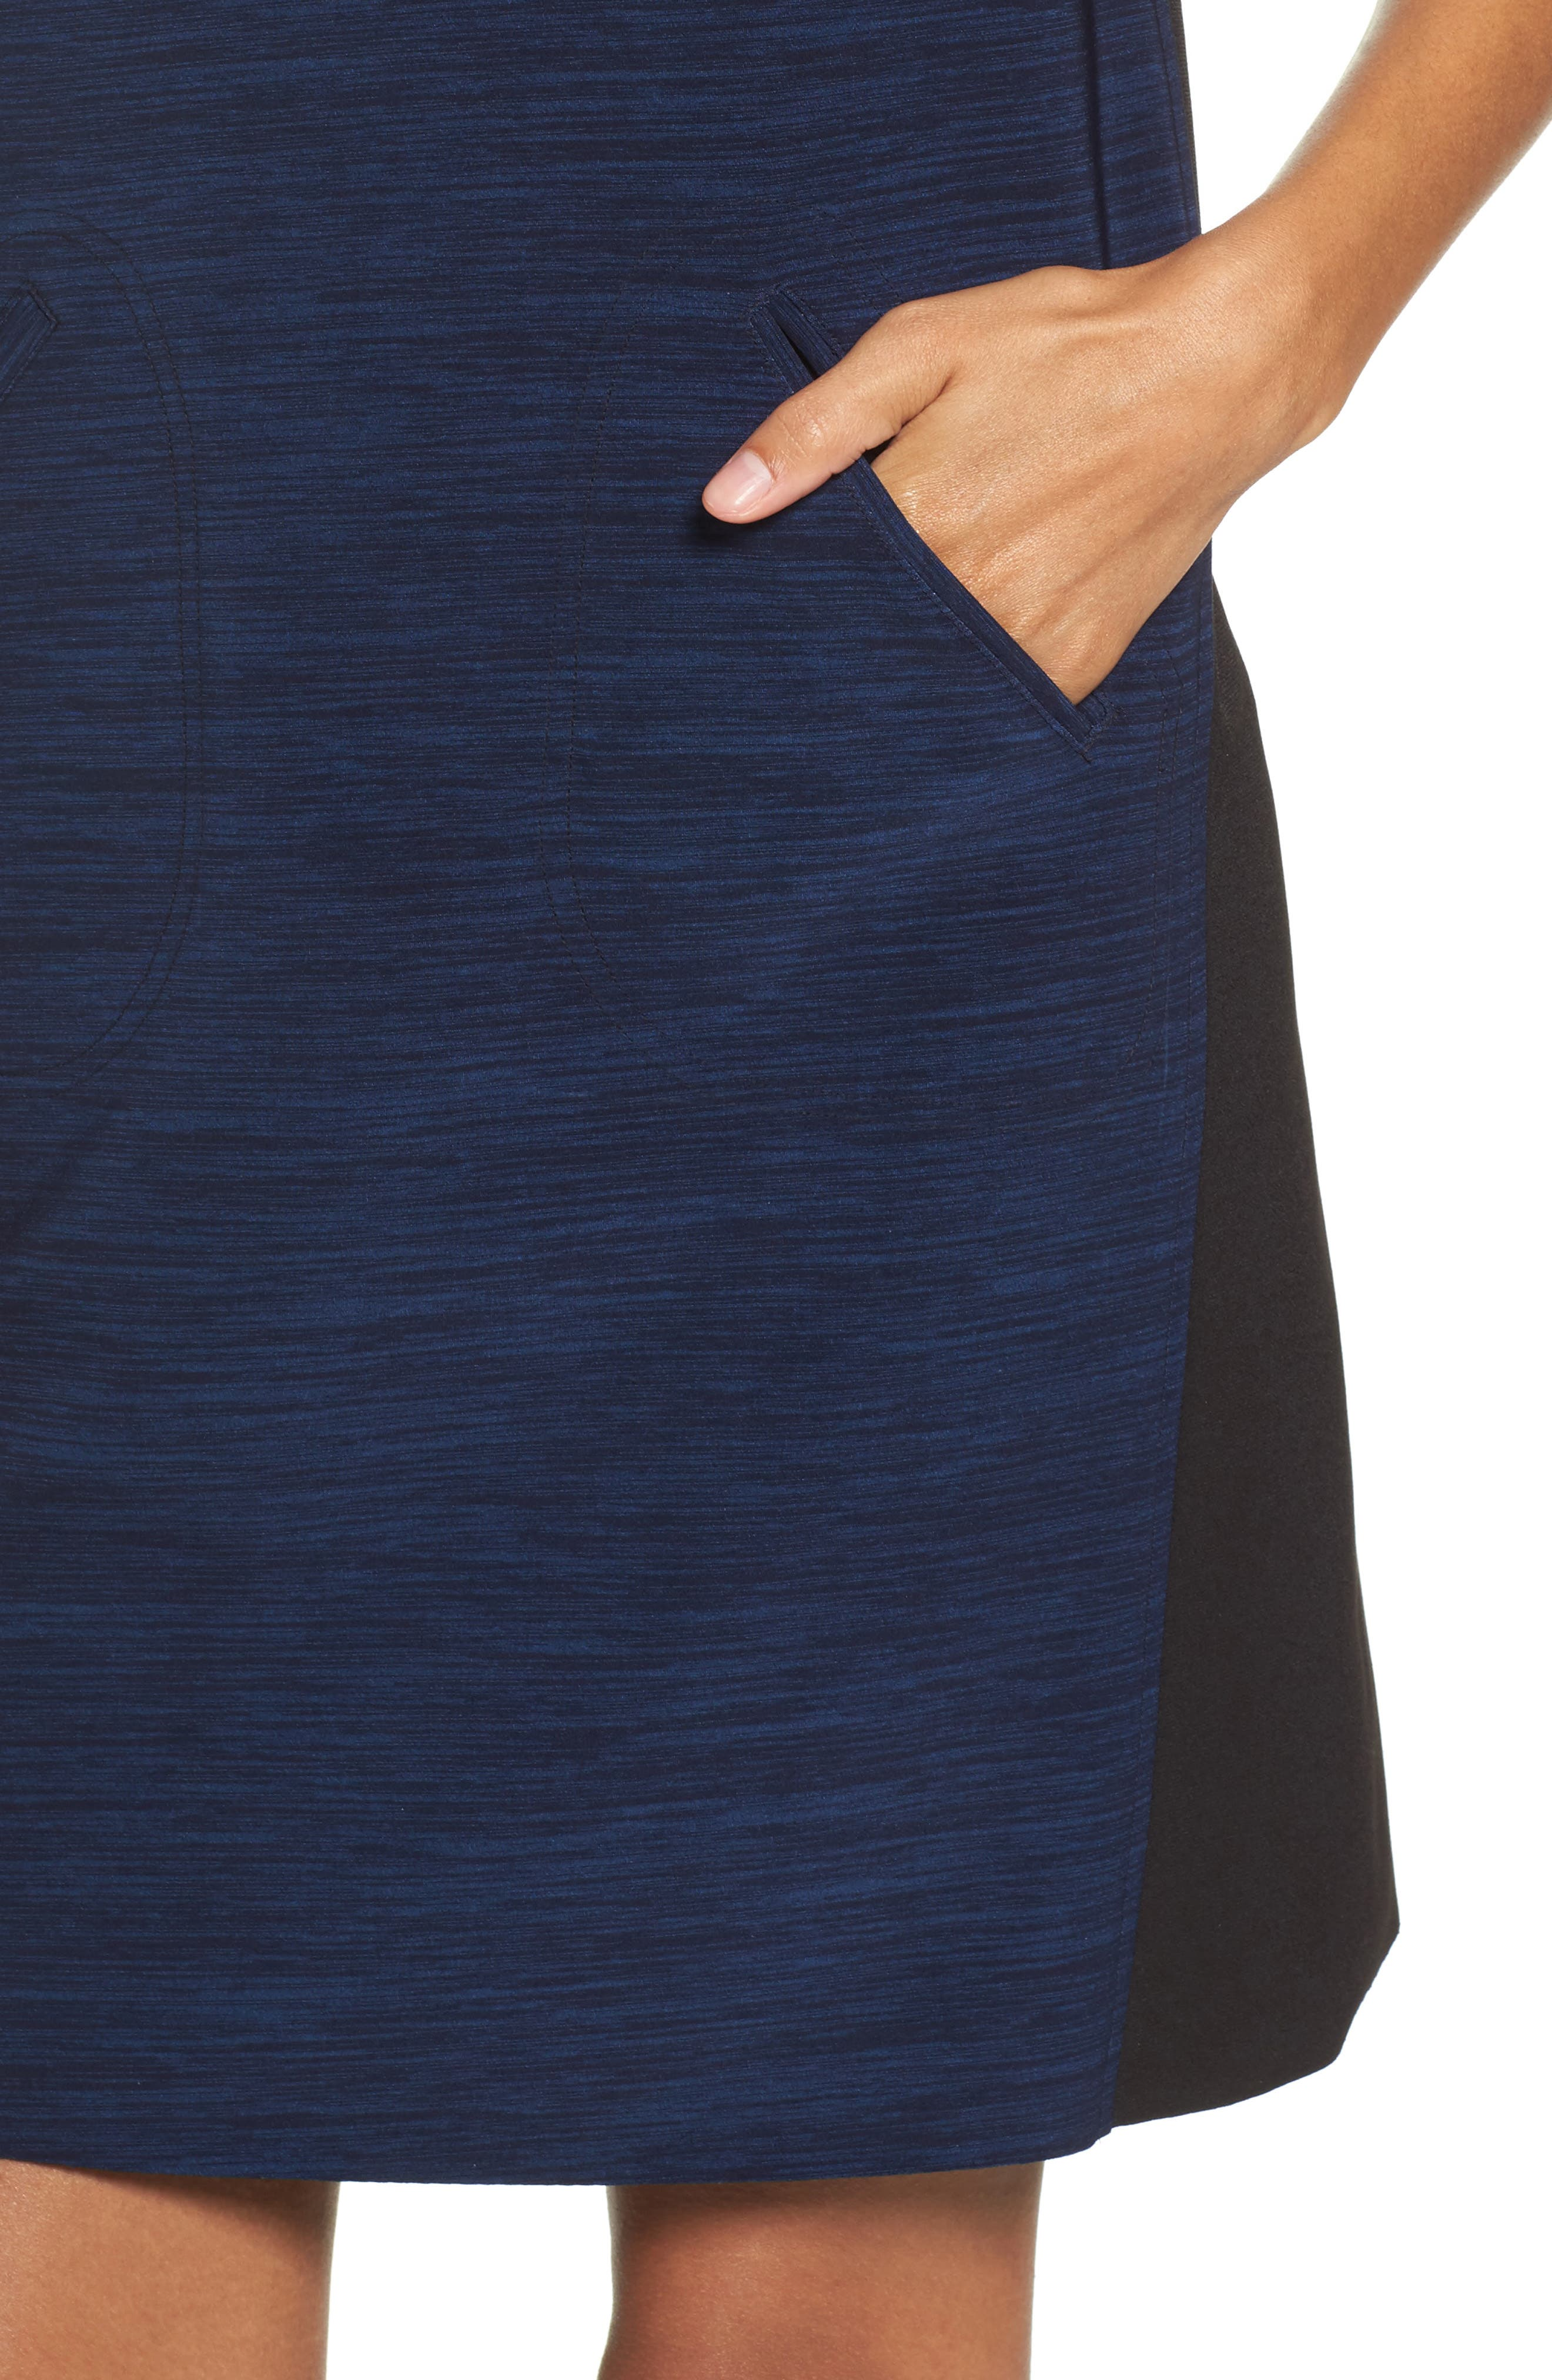 Turtleneck Shift Dress,                             Alternate thumbnail 5, color,                             Black Navy